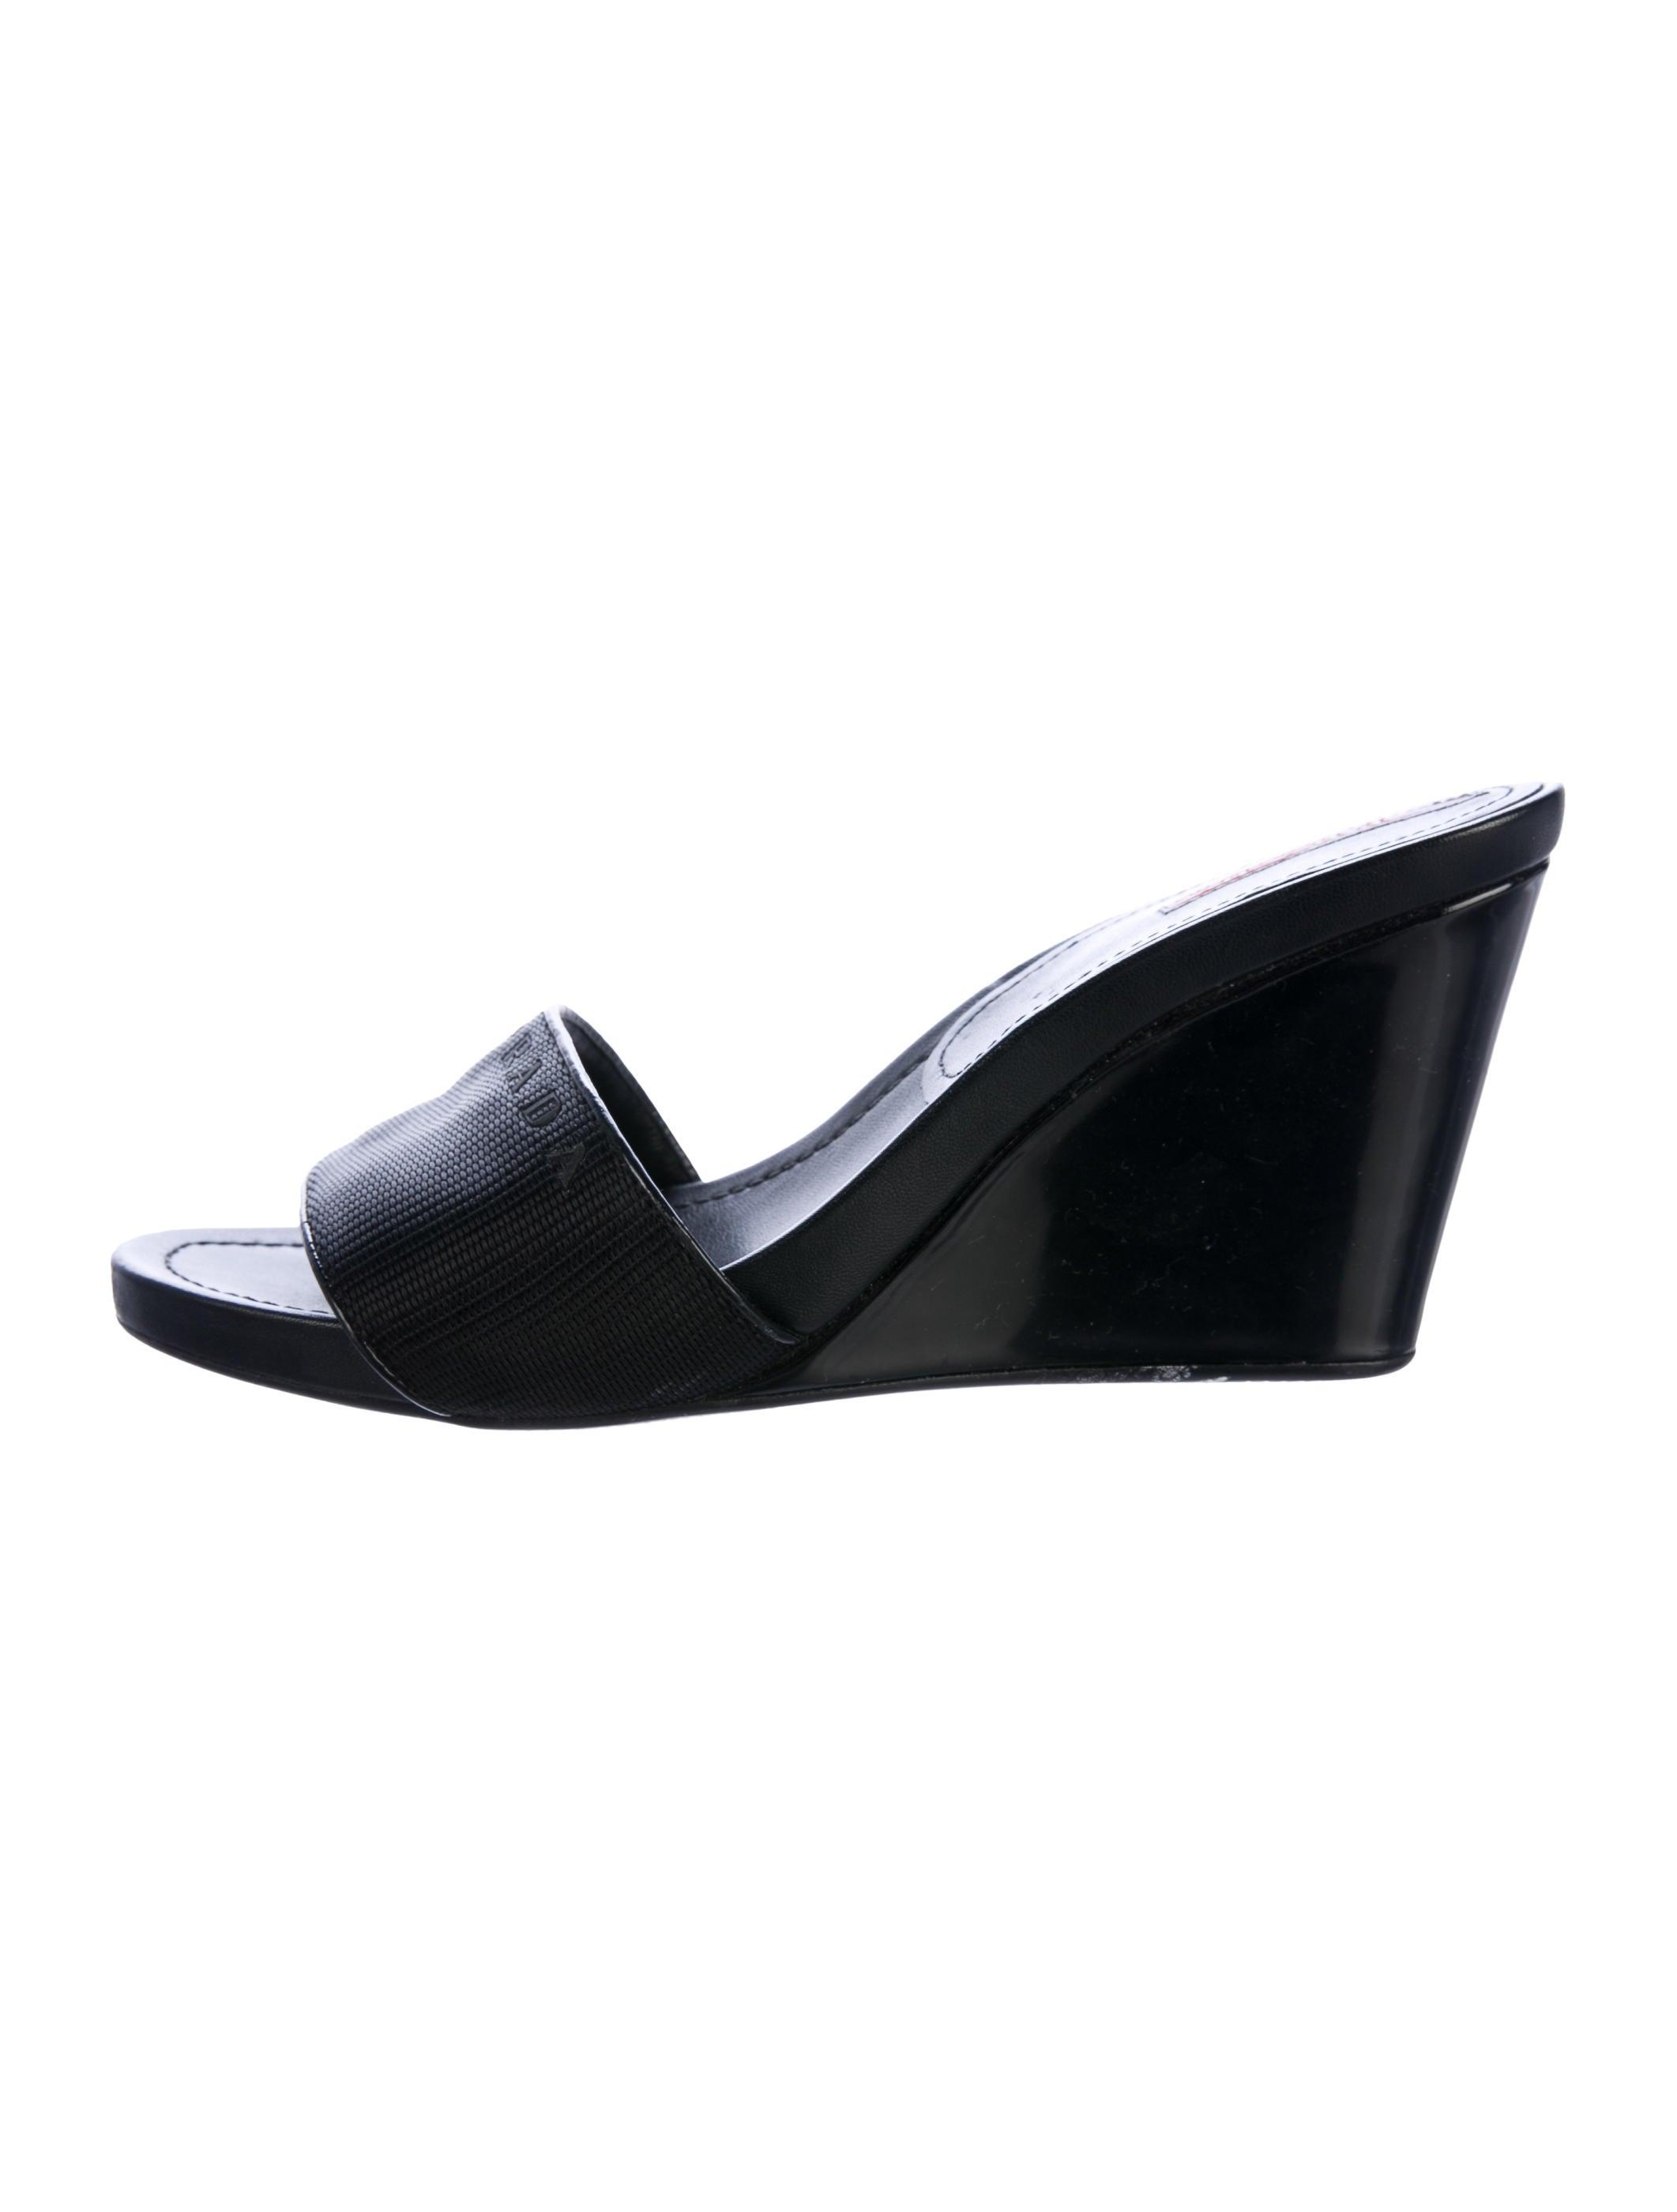 1f6ded318ef4 Prada Sport Logo Wedge Sandals - Shoes - WPR46334